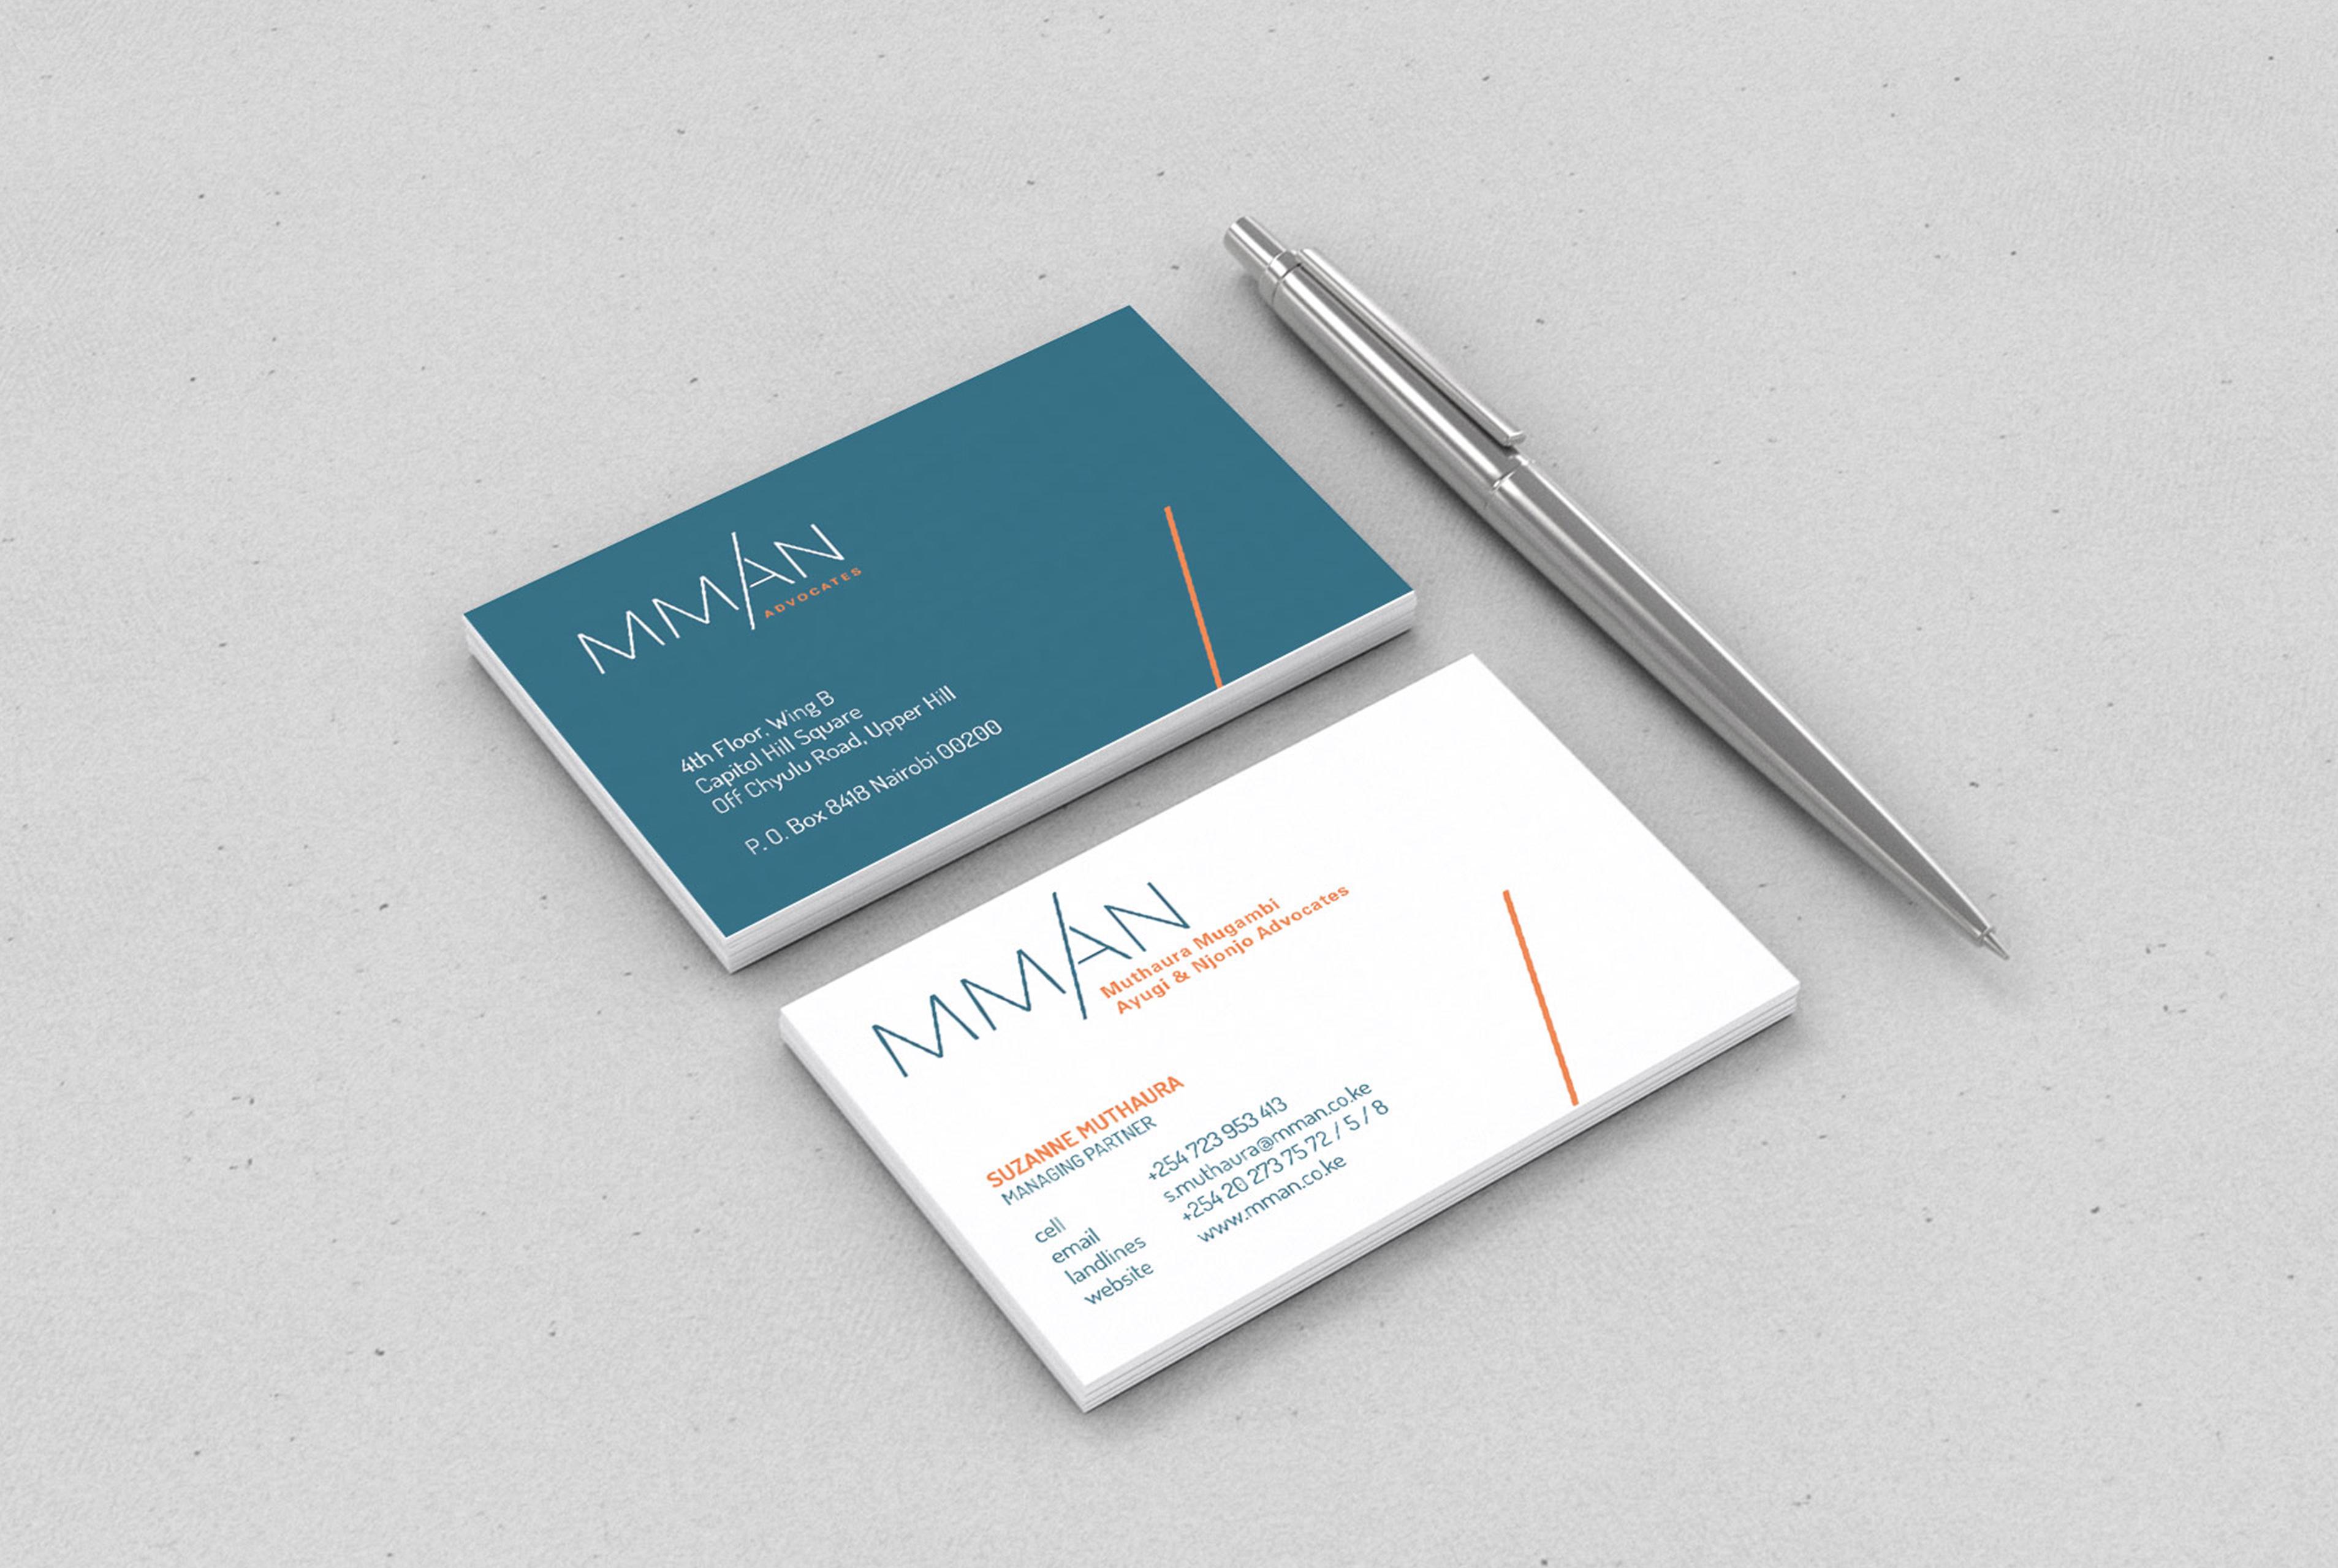 MMAN Advocates | AKSENT